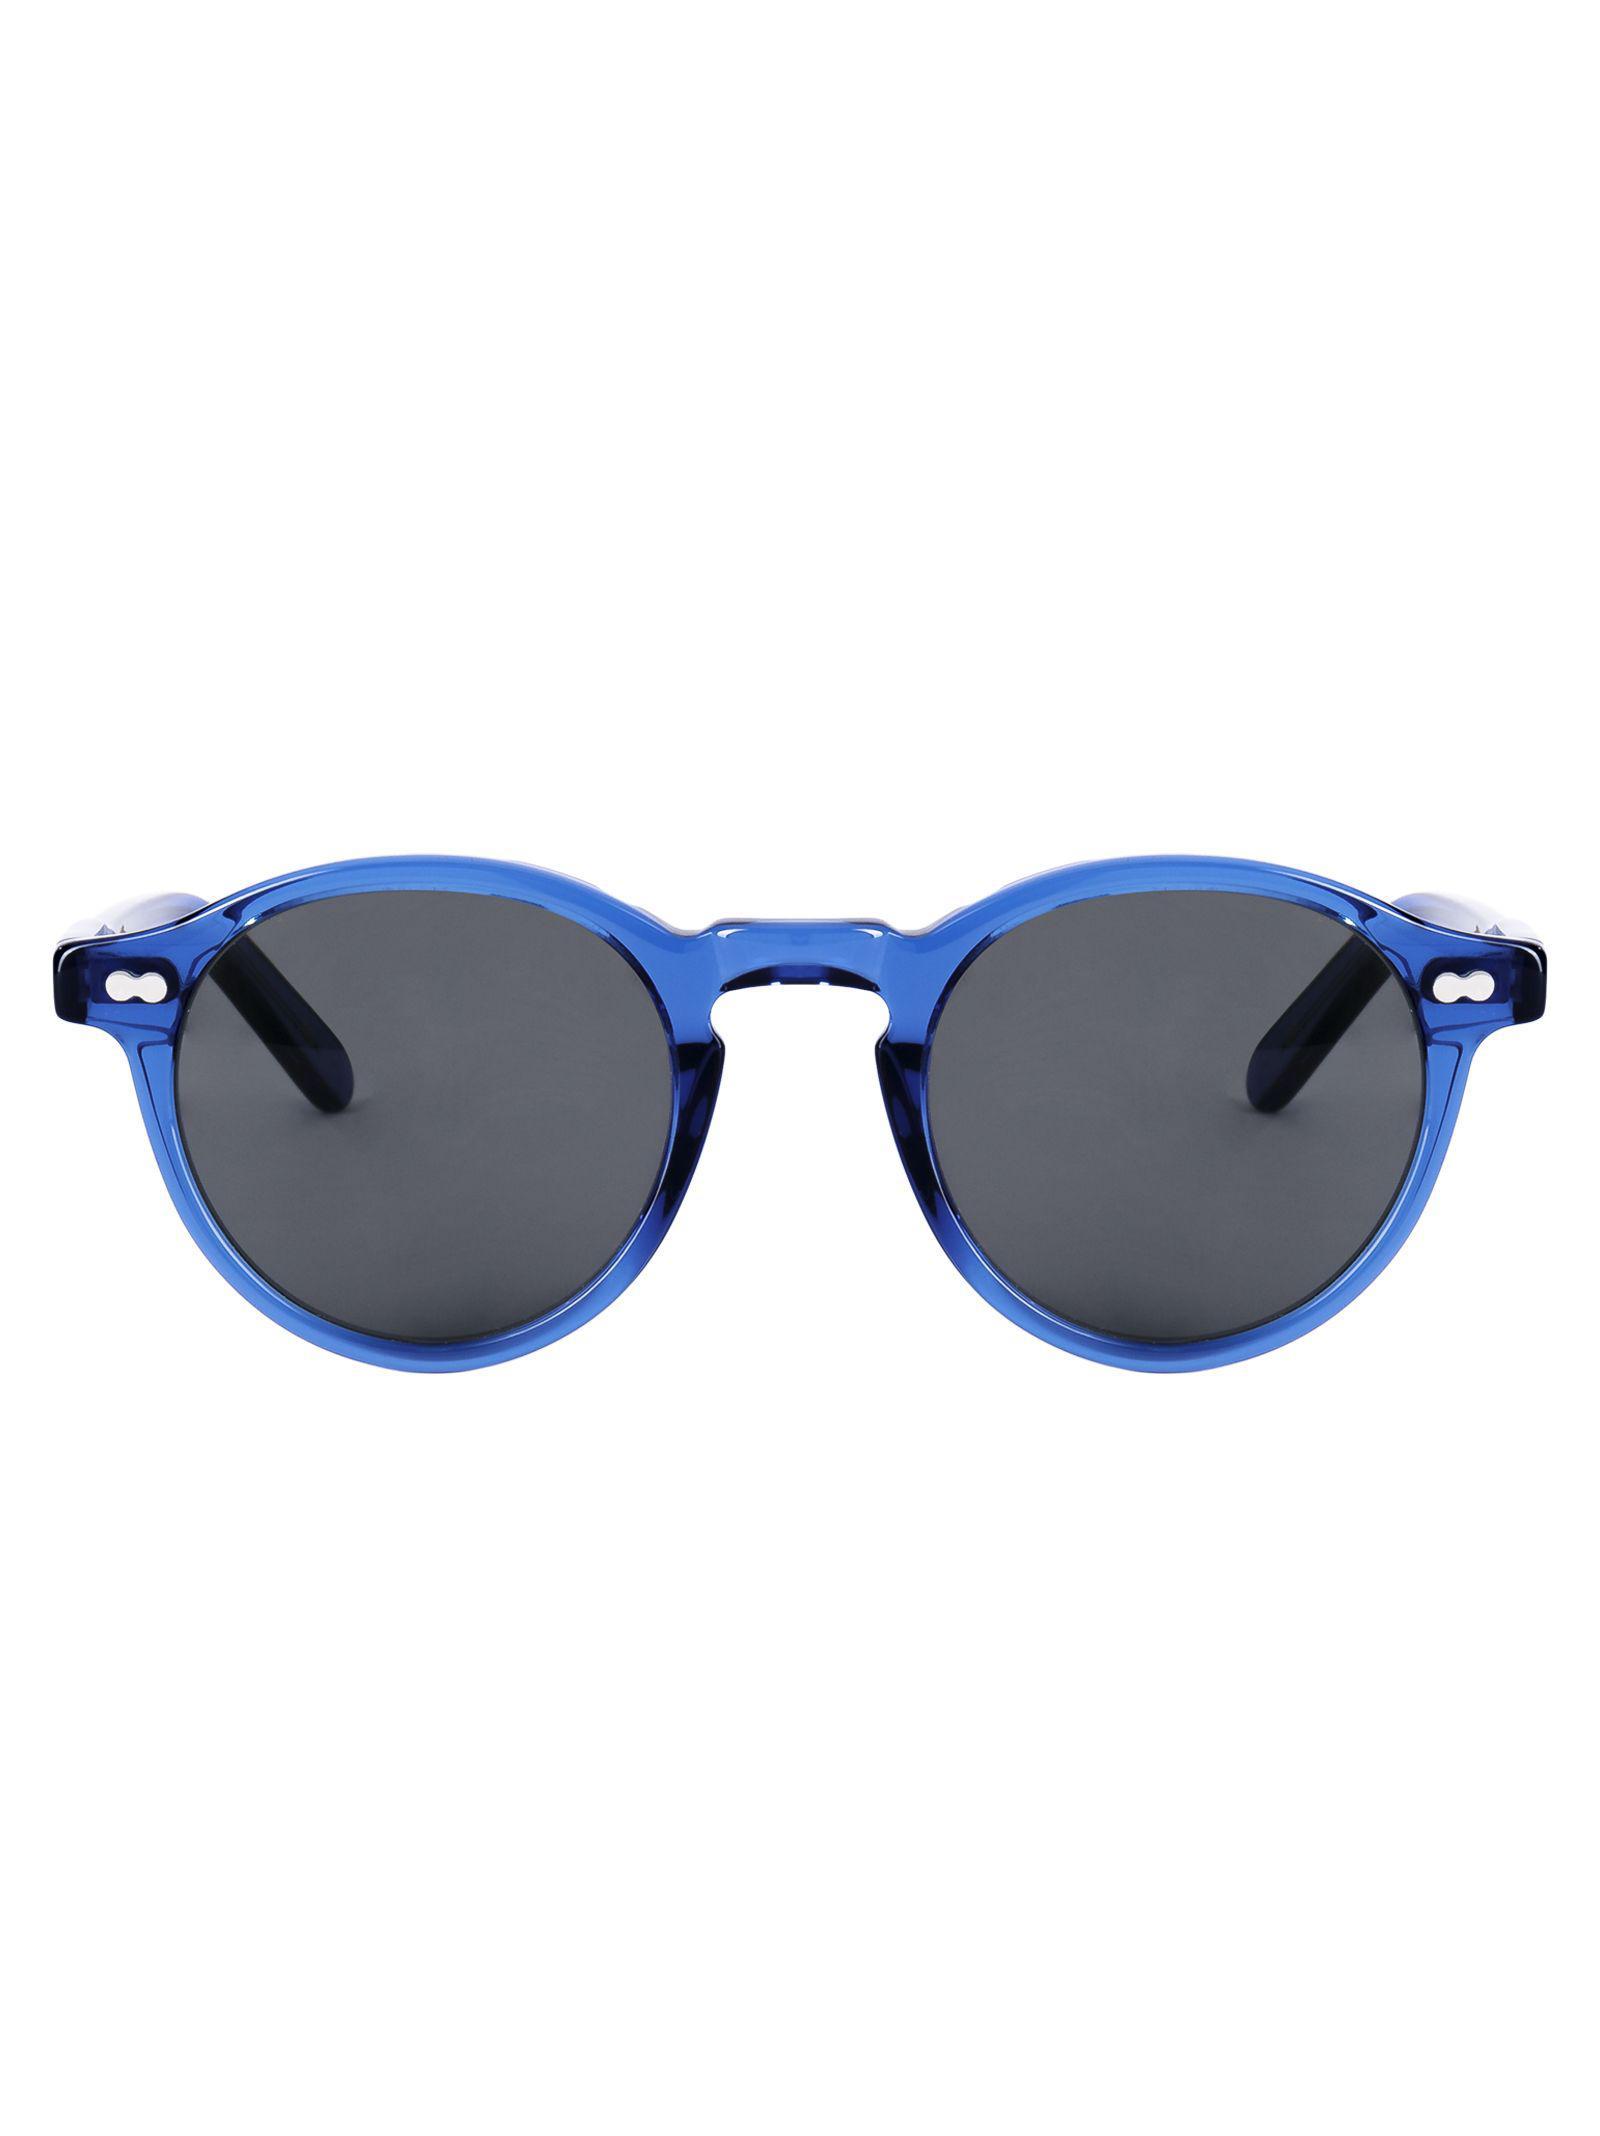 7508dbfe75b Moscot Miltzen Sunglasses In Sapphire | ModeSens